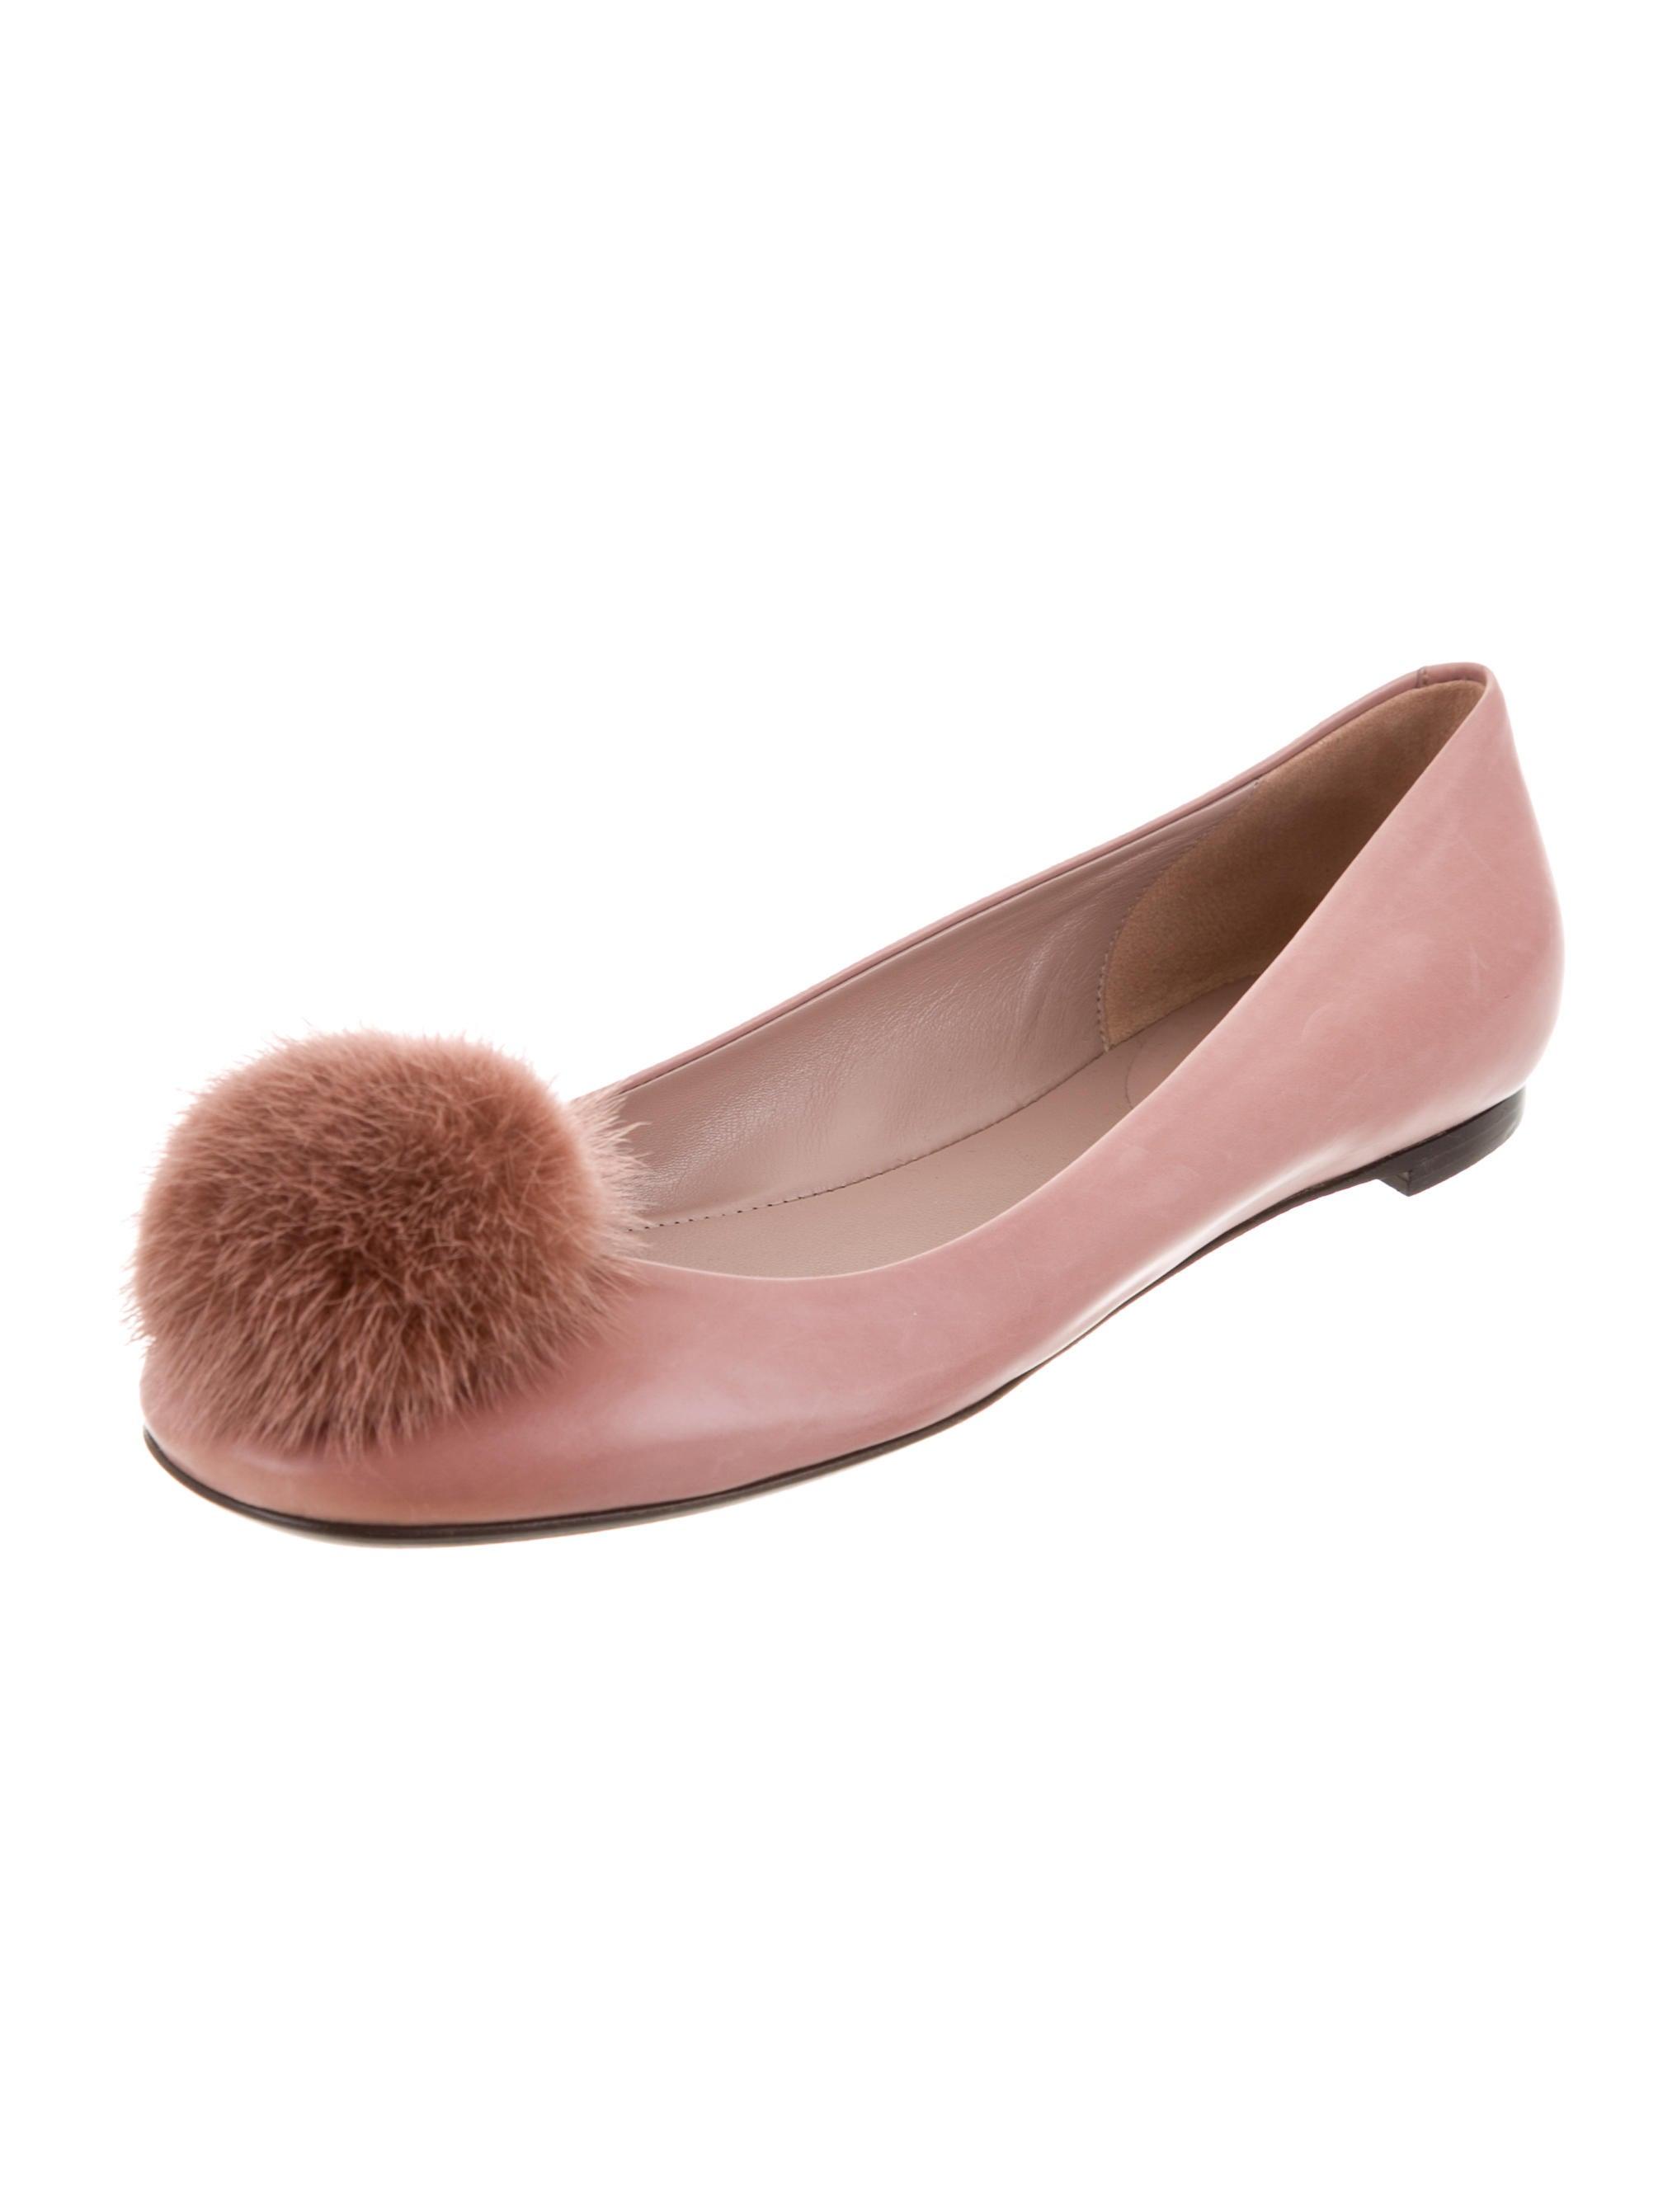 Gucci Mink Fur Pom-Pom Flats - Shoes